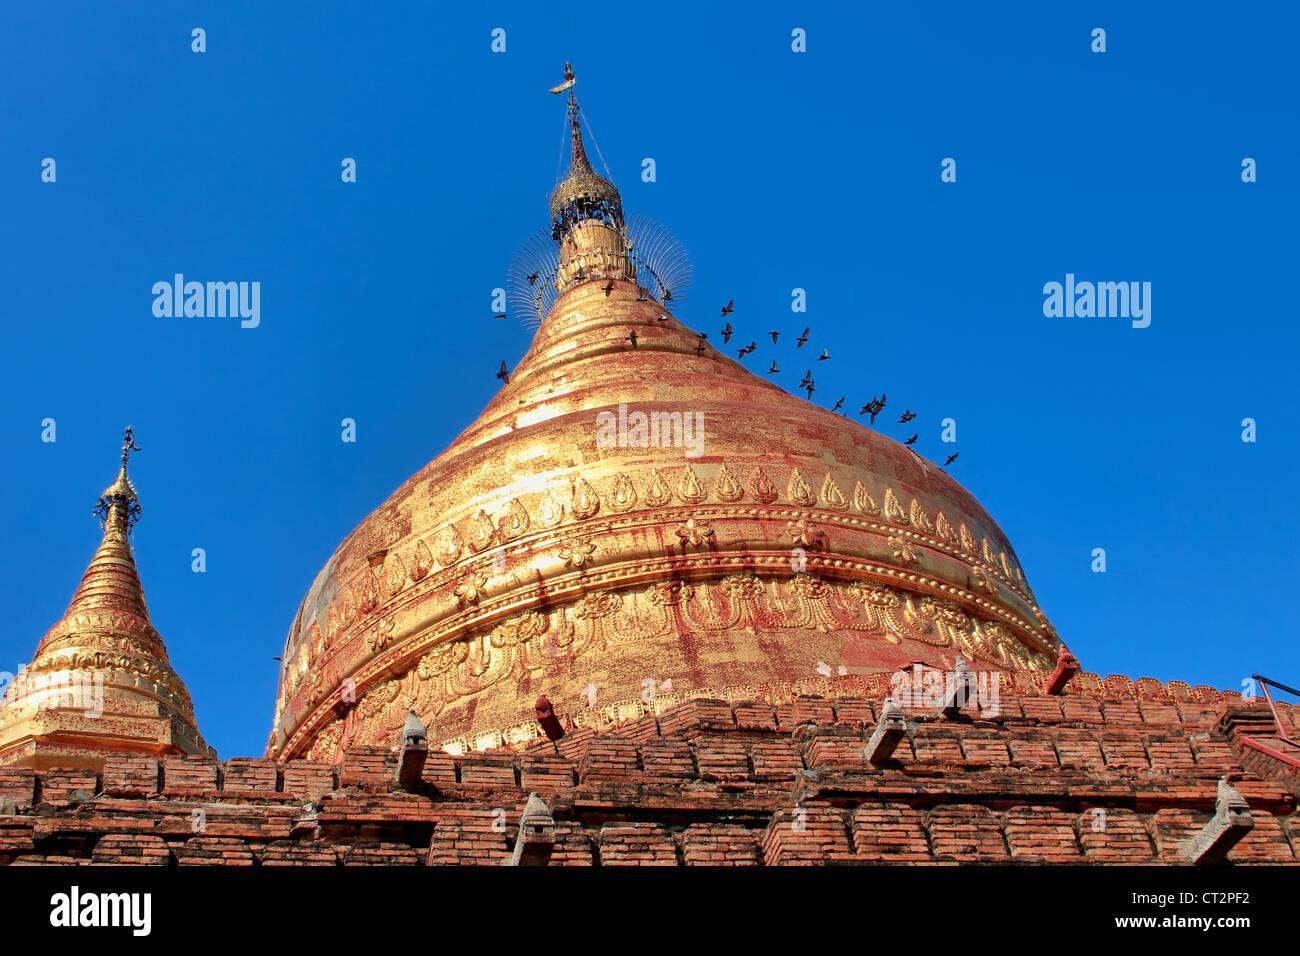 Chedi of Dhammayazika Paya (Pagoda)   Bagan (Pagan)   Myanmar (Burma) Stock Photo